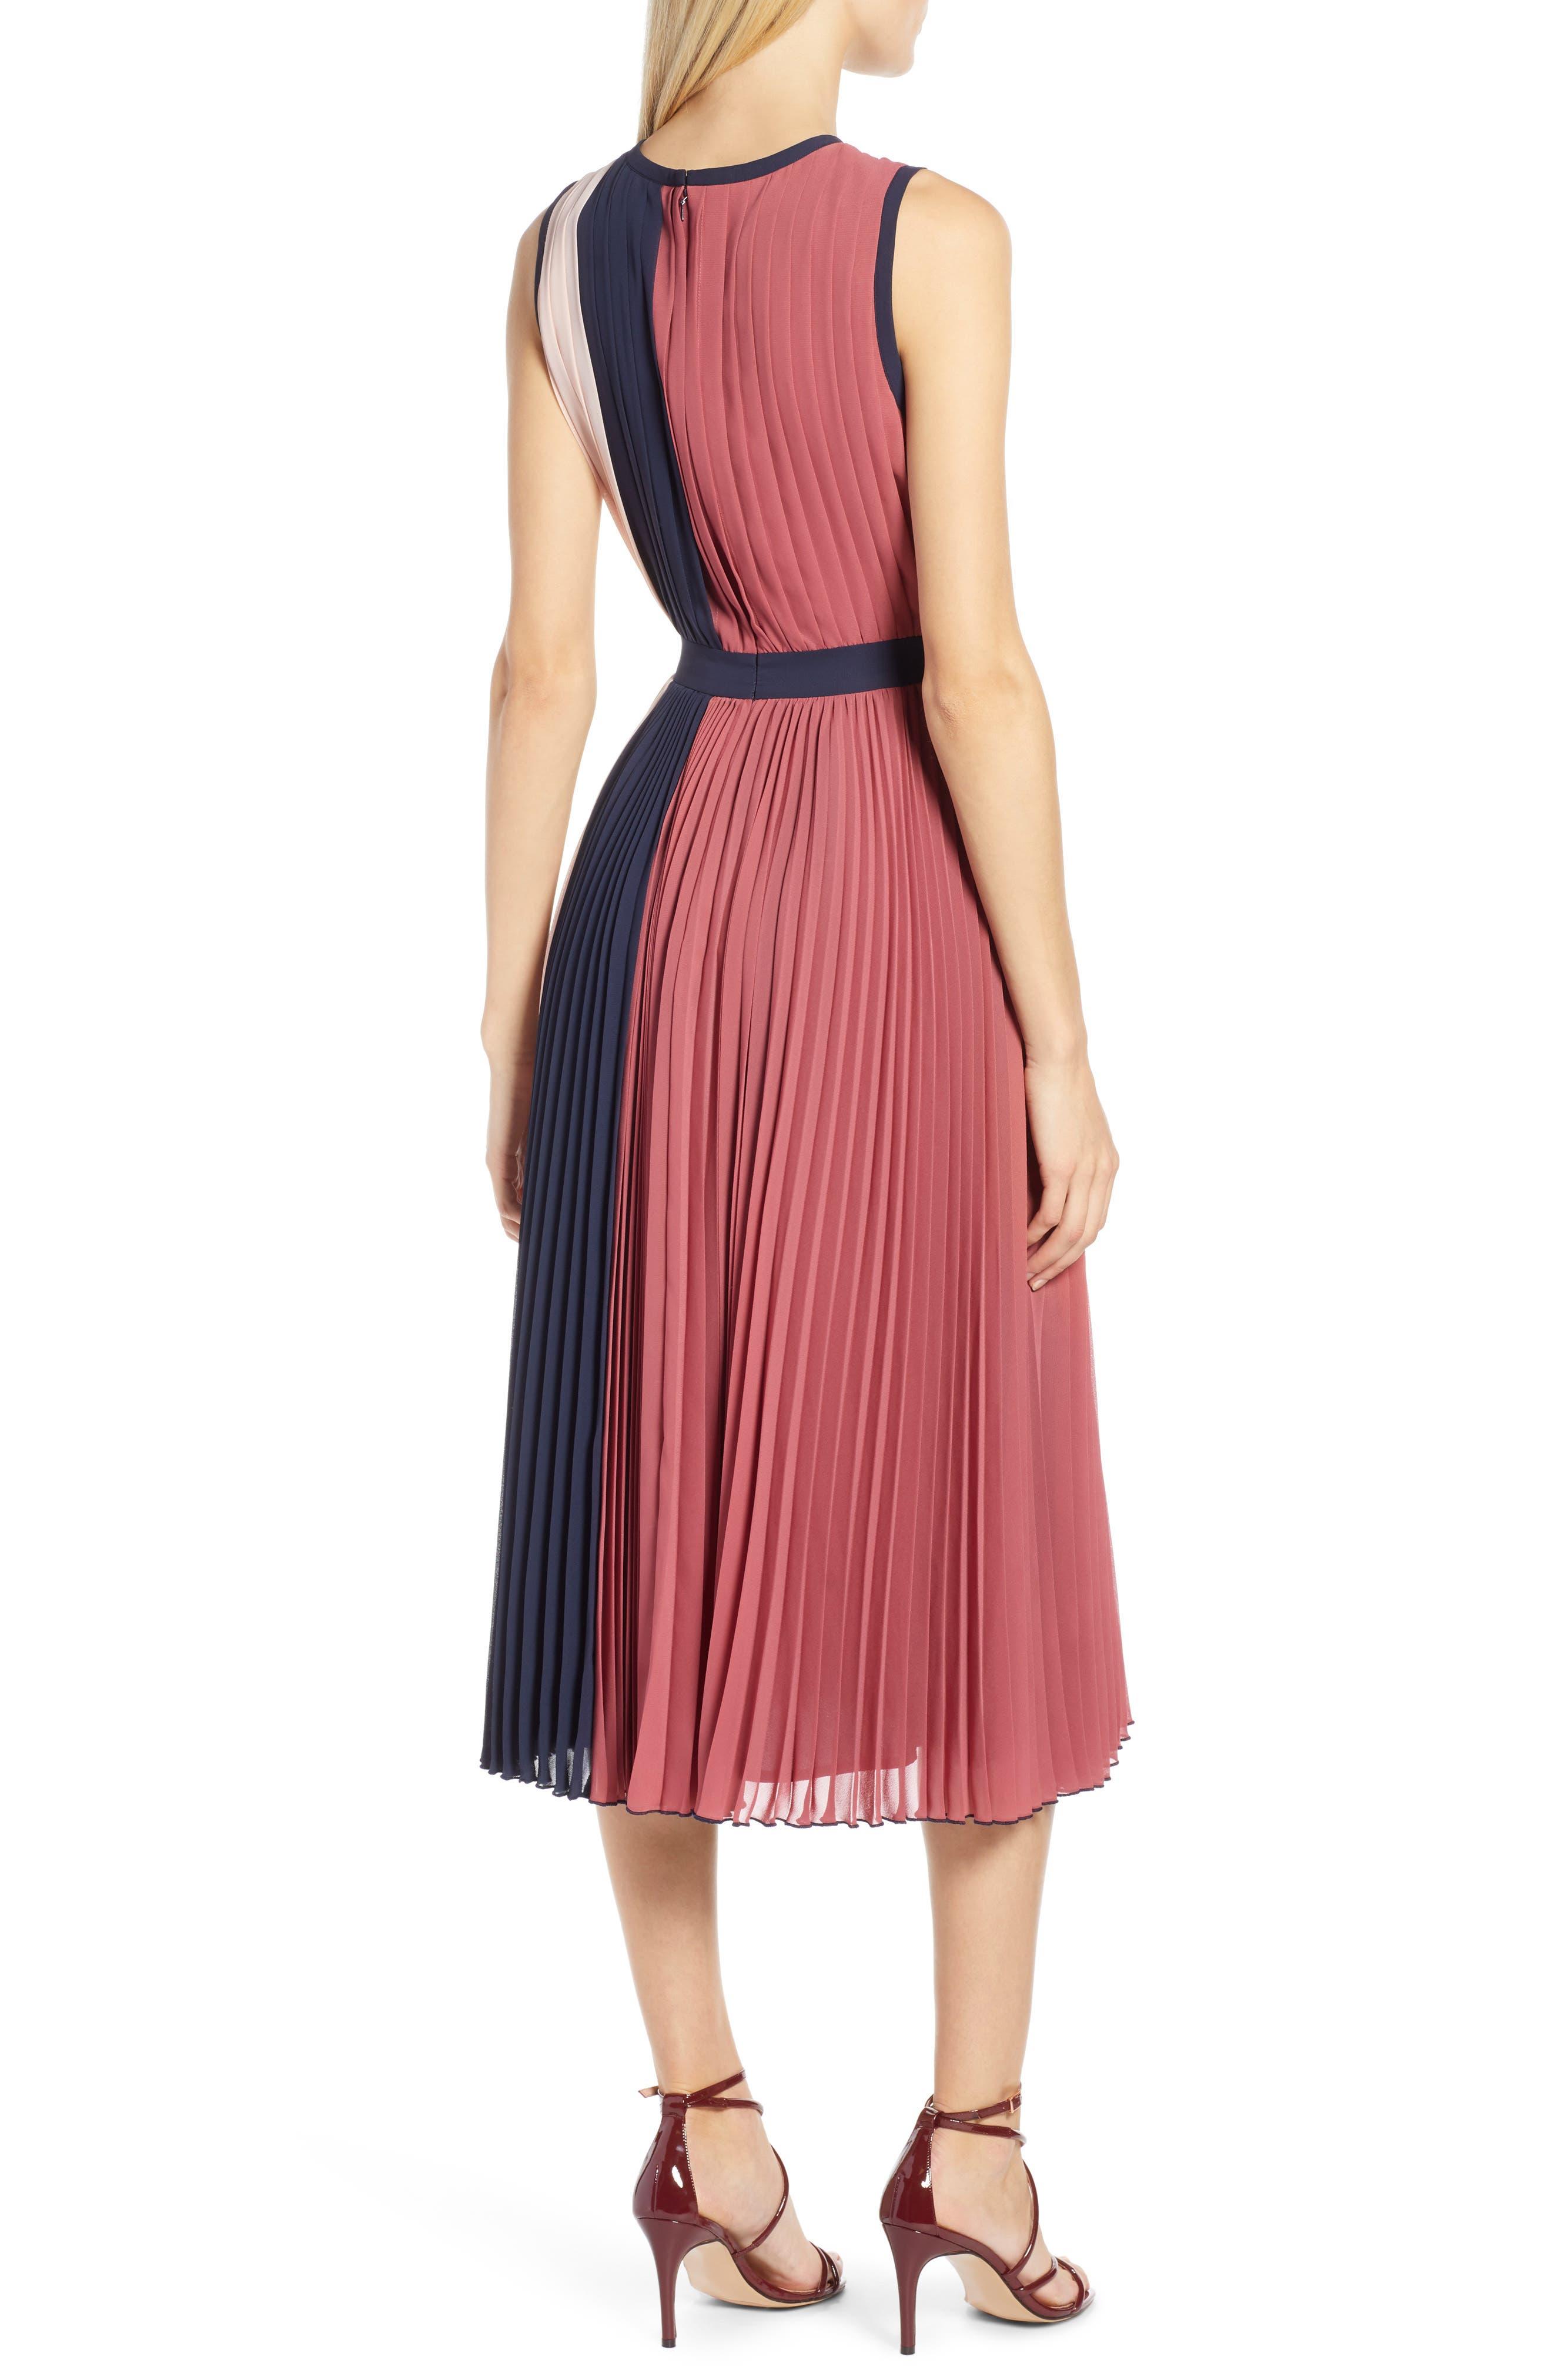 x Atlantic-Pacific Colorblock Pleated Midi Dress,                             Alternate thumbnail 2, color,                             PINK- NAVY COLORBLOCK